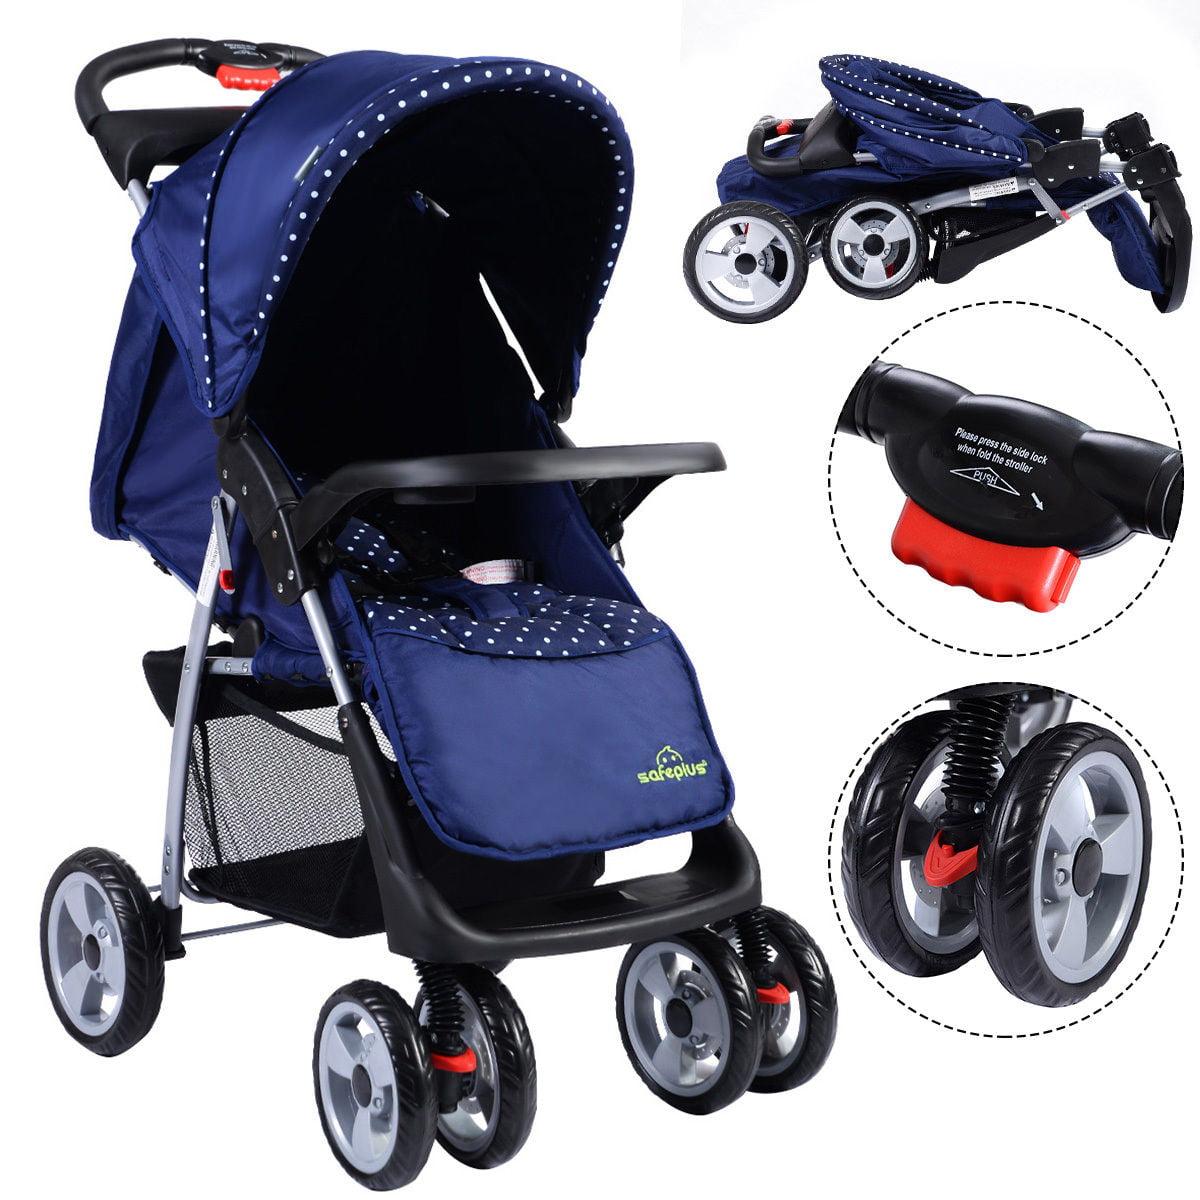 Costway Foldable Baby Kids Travel Stroller Newborn Infant